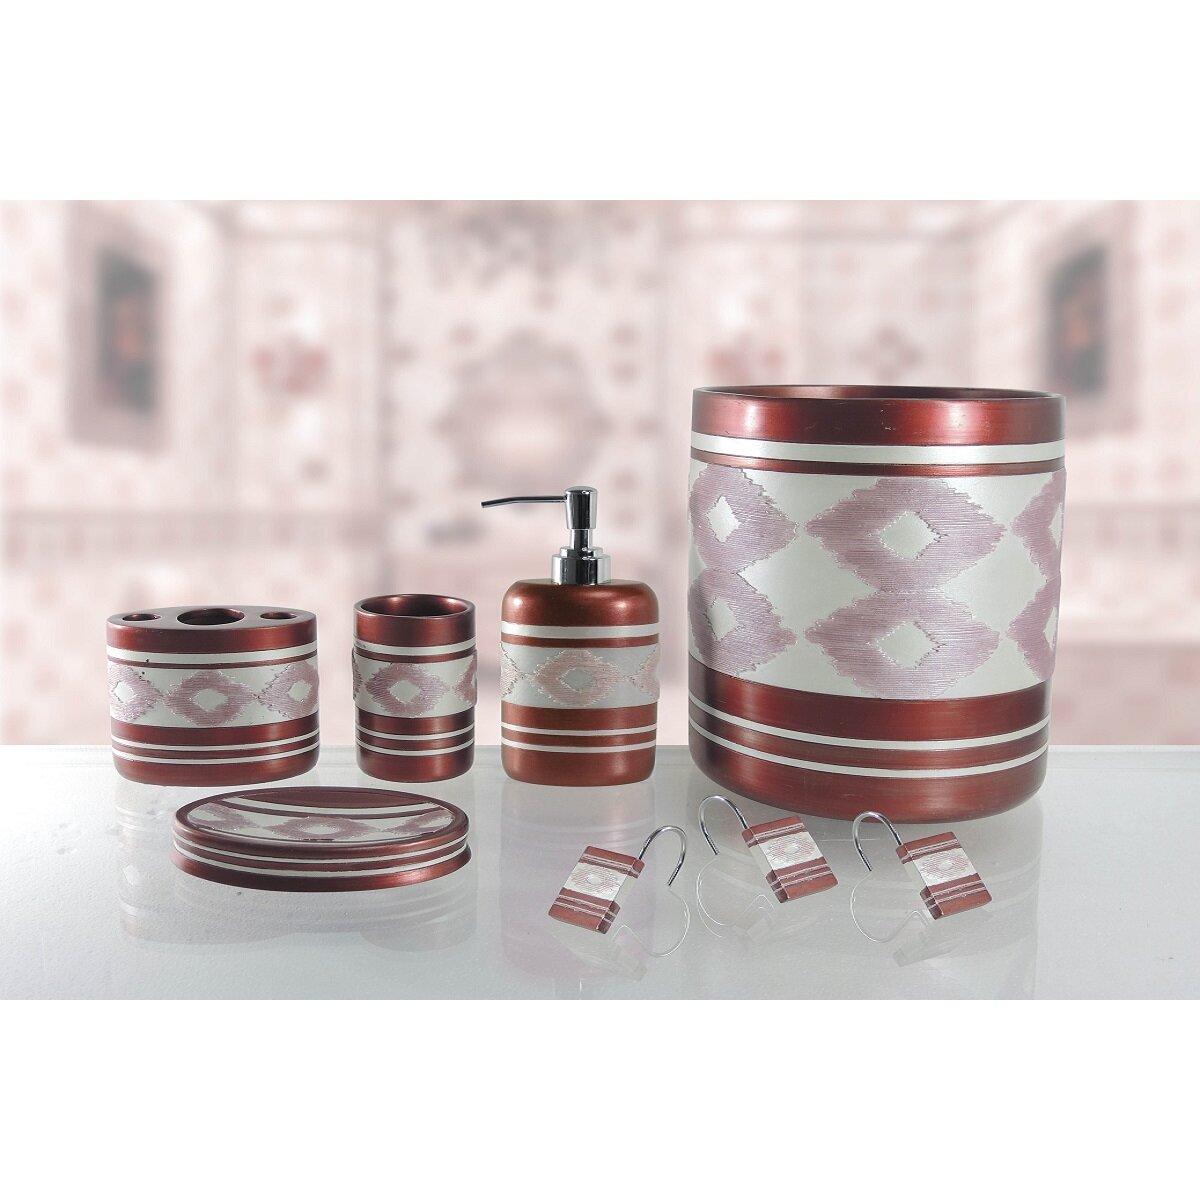 Daniels bath michelle 5 piece bathroom accessory set wayfair for Bathroom 5 piece set